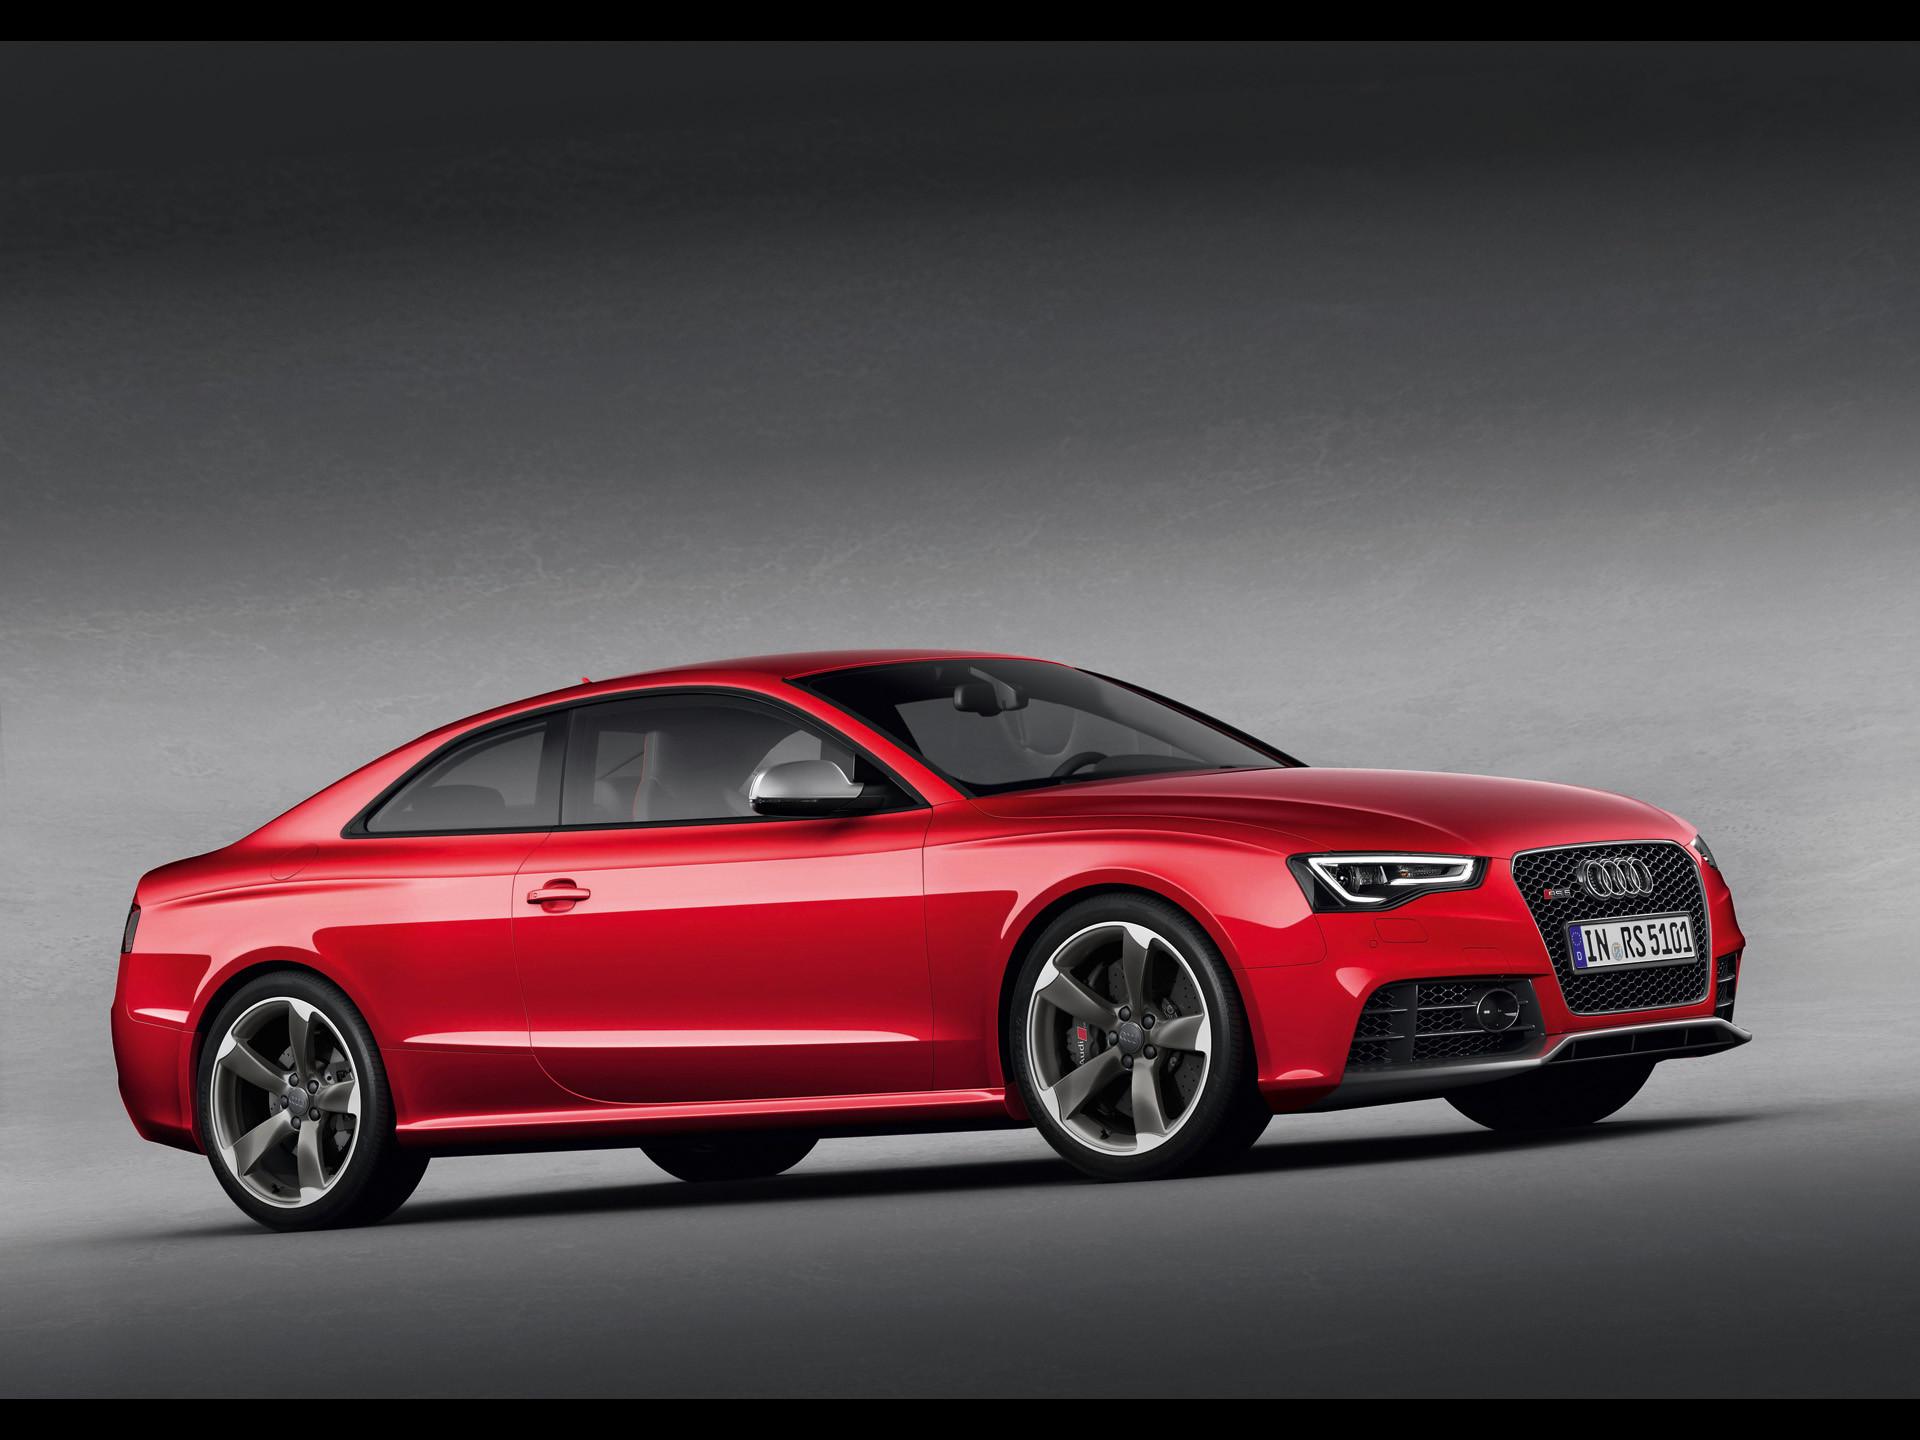 Elegant 1920x1080 Audi RS5 Tuning Front Fire Car 2014 HD